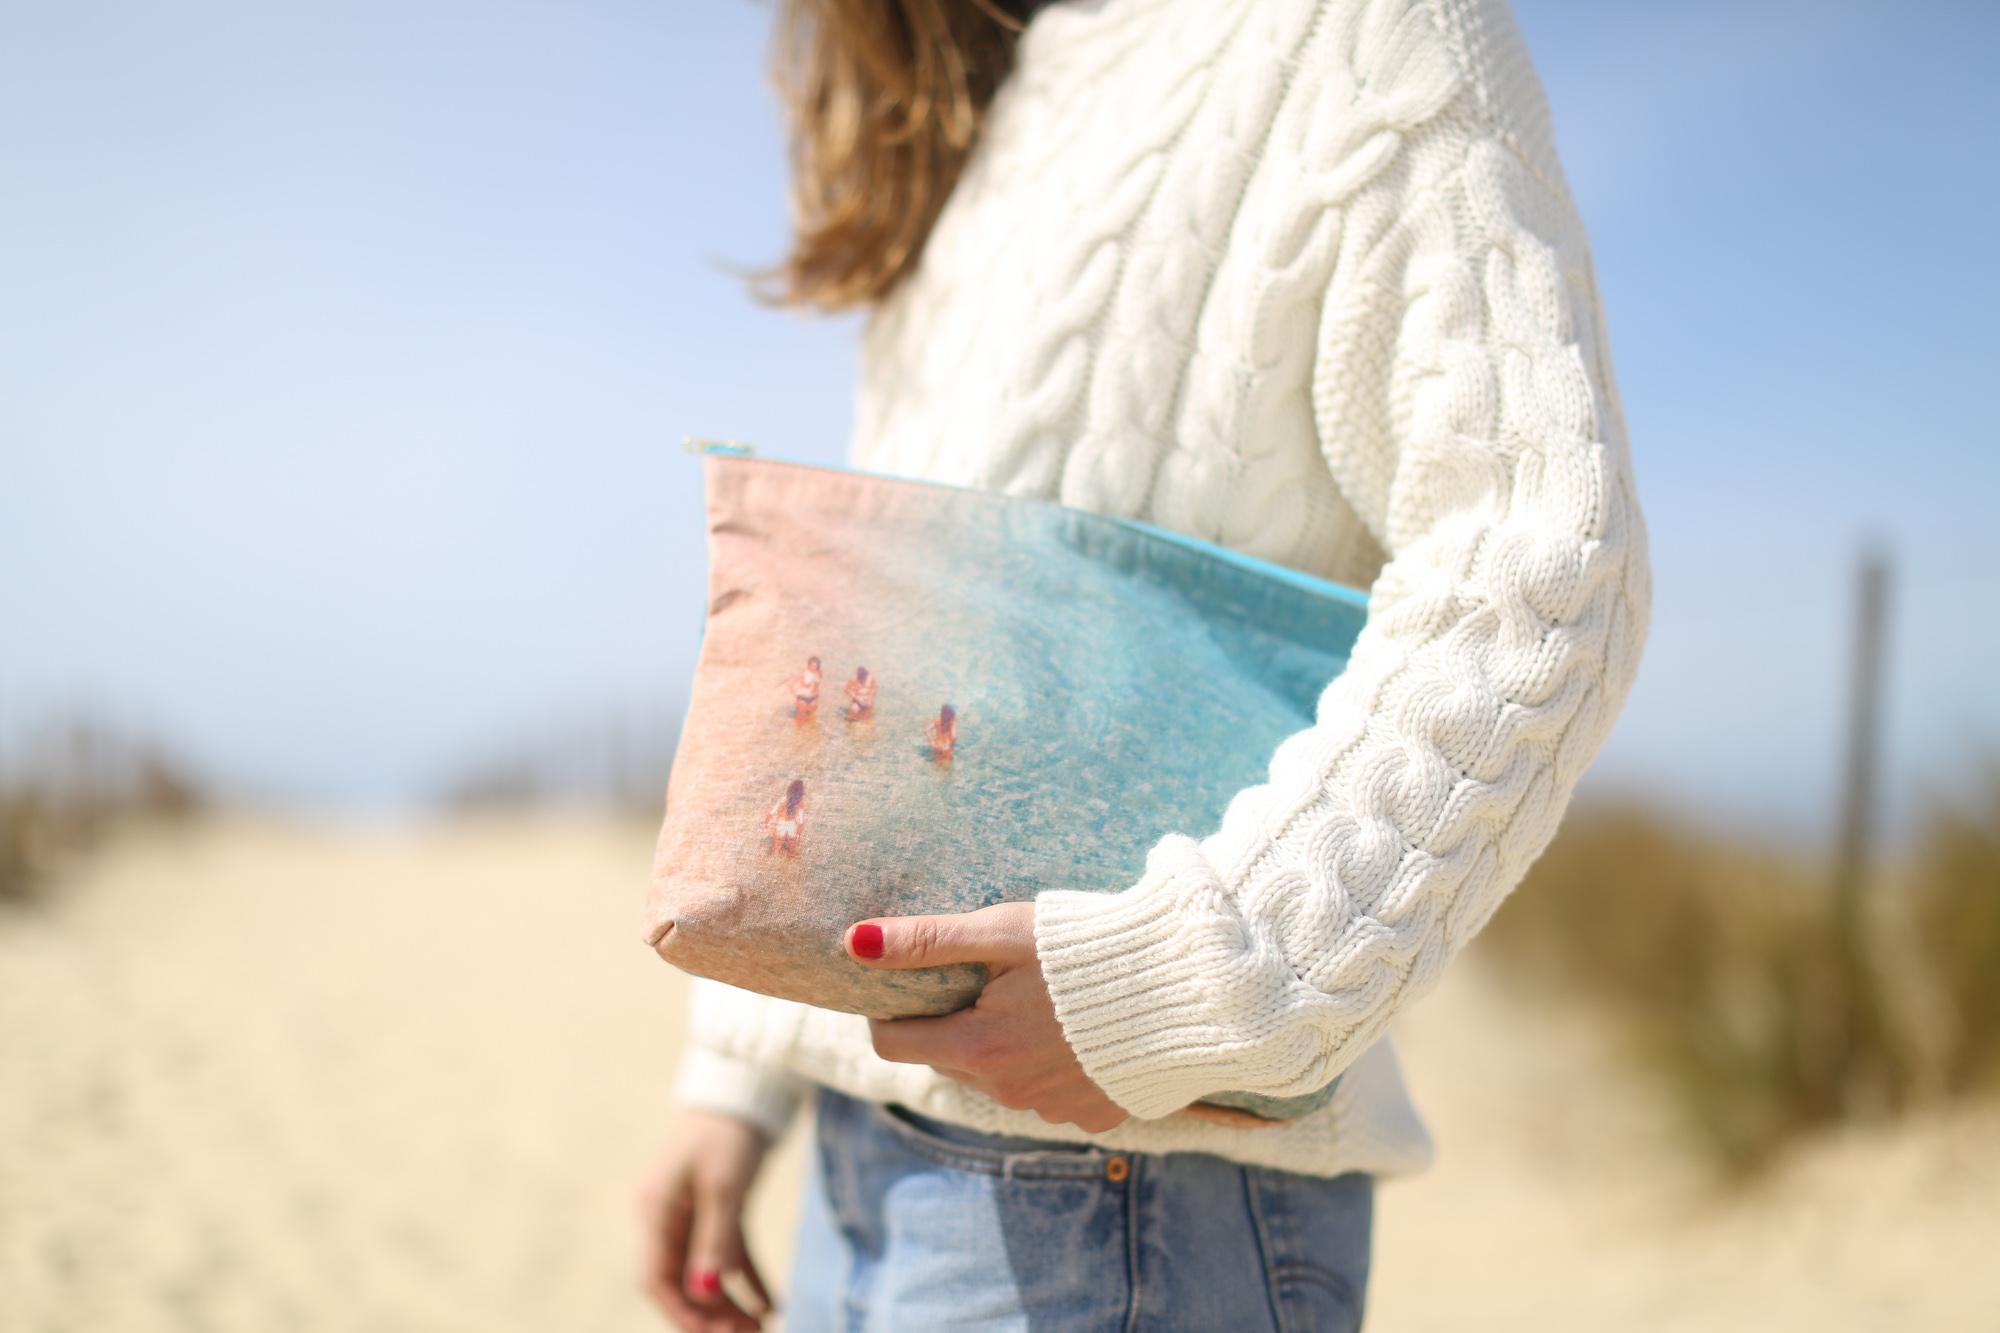 Clochet-streetstyle-levis-501-vintage-shorts-superga-crochet-thalatta-concept-bathers-pouch-4